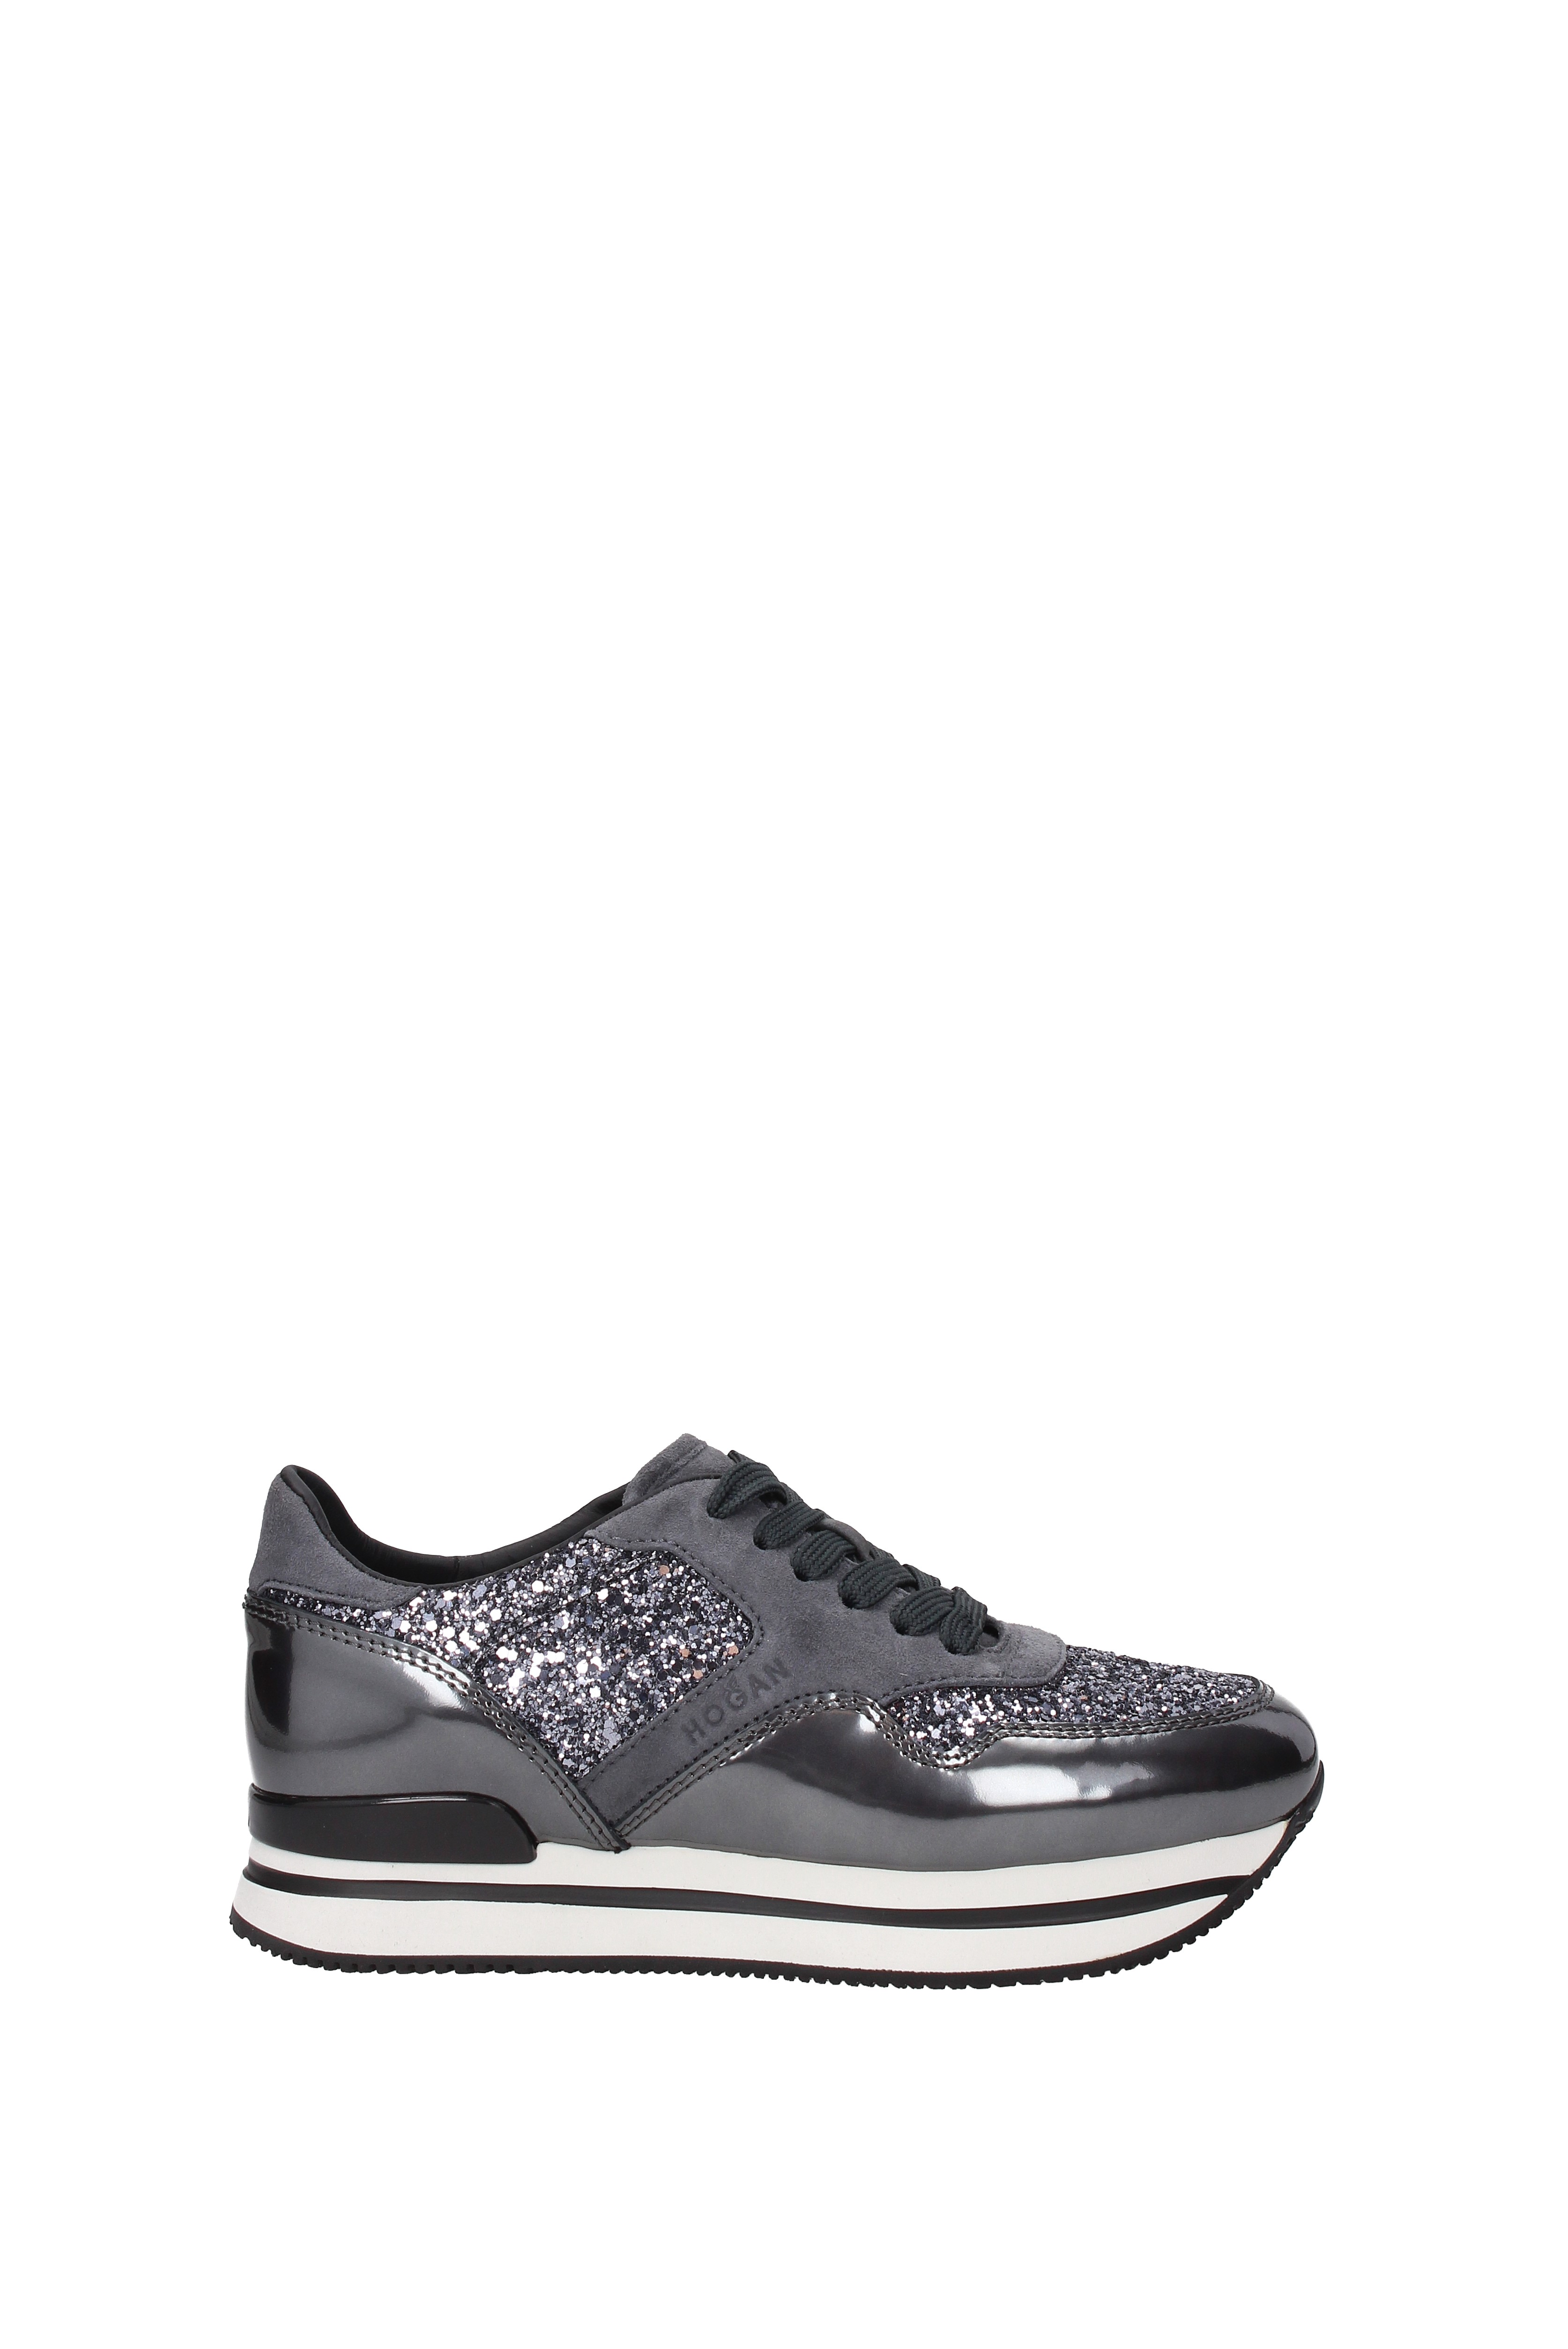 Sneakers Hogan Women - - Women Glitter (HXW2220N622CRN) 033388